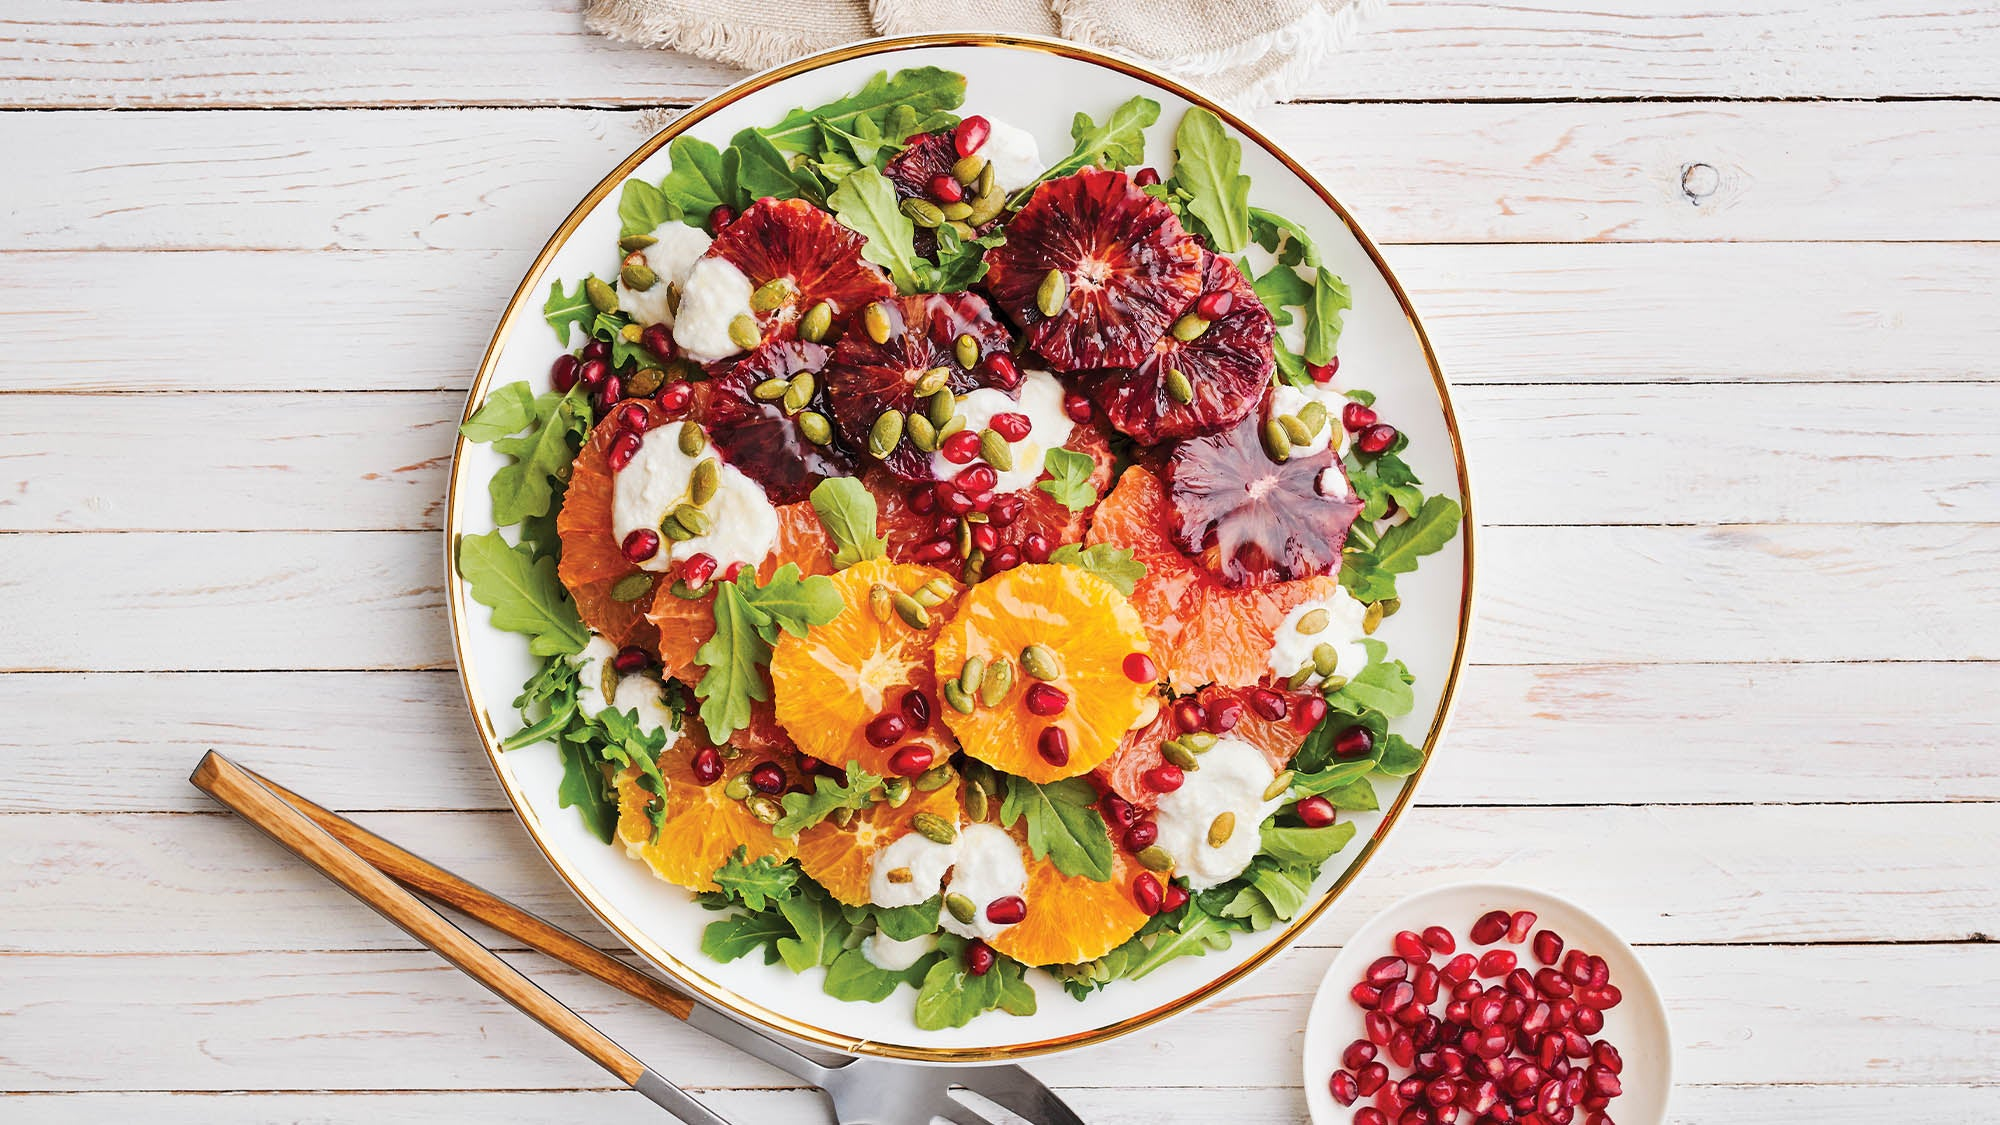 Mixed Citrus & Arugula Salad with Ricotta & Pumpkin Seeds recipe